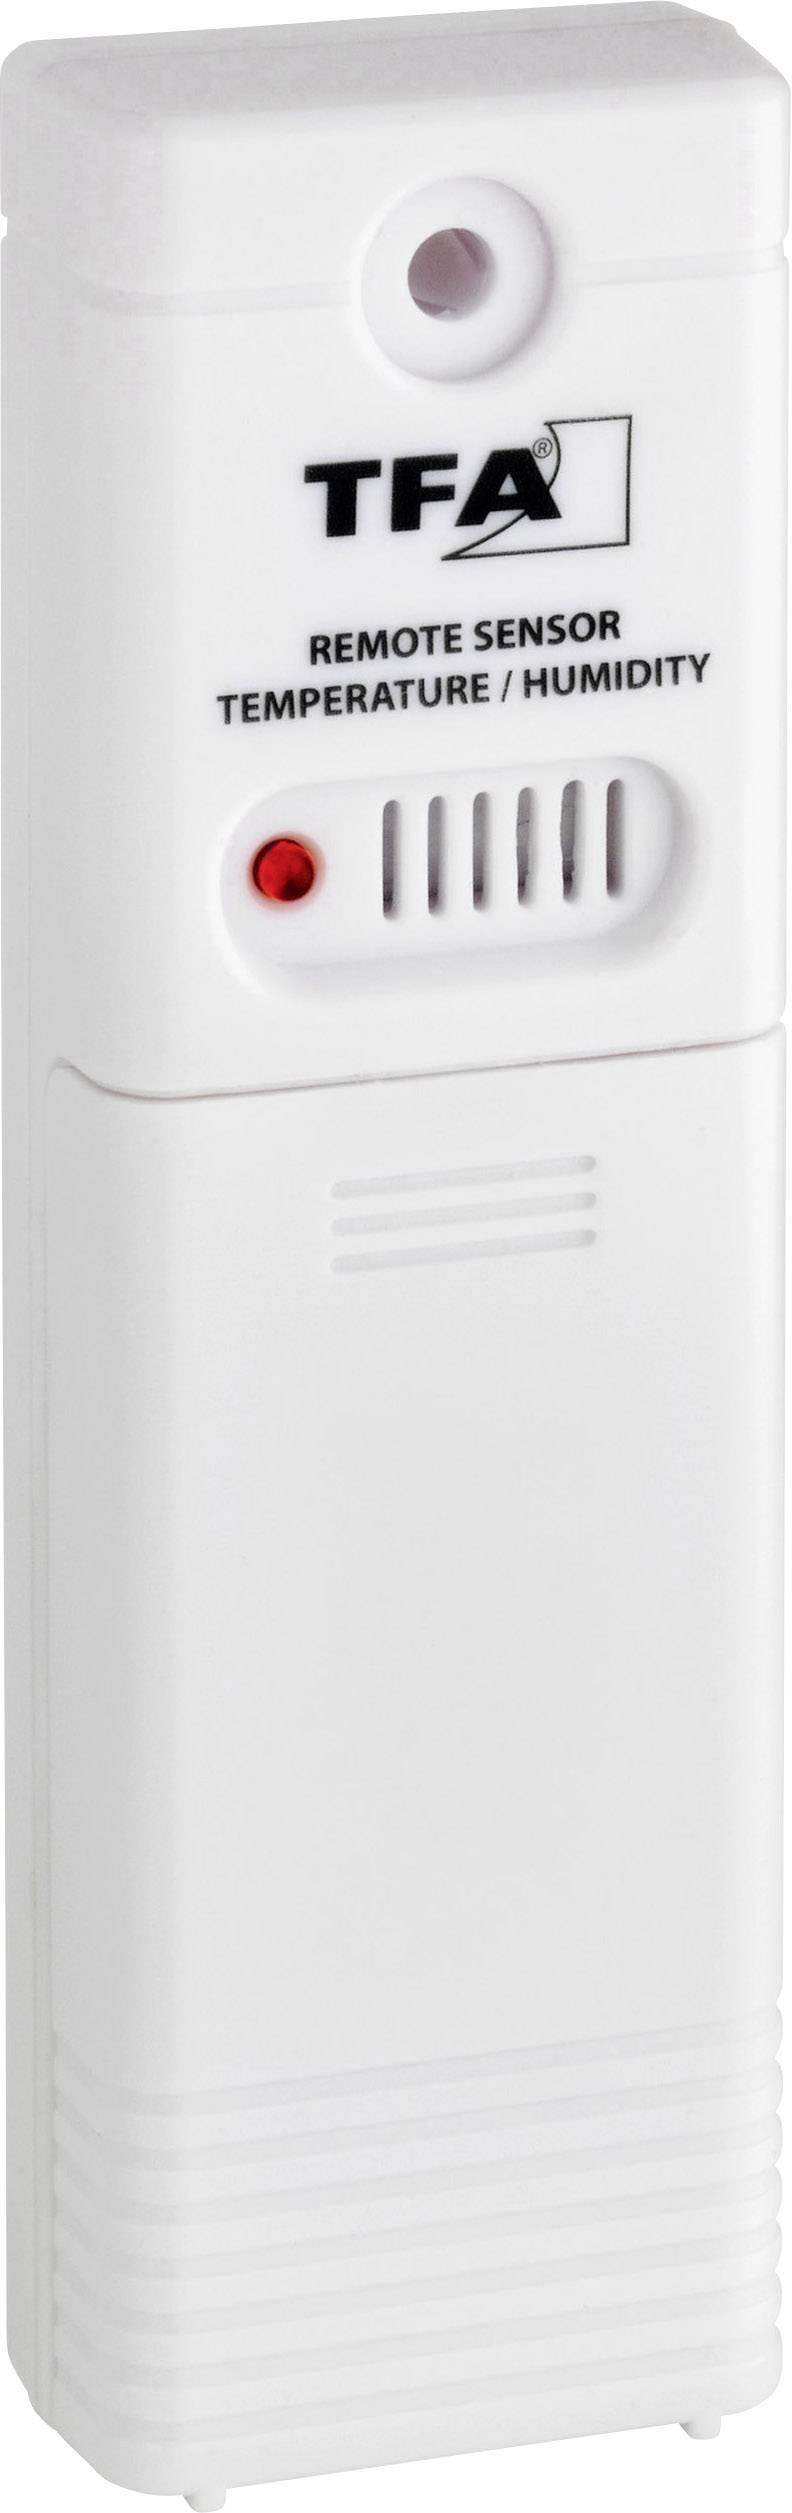 Kombinovaný senzor TFA 30.3221.02 30.3221.02